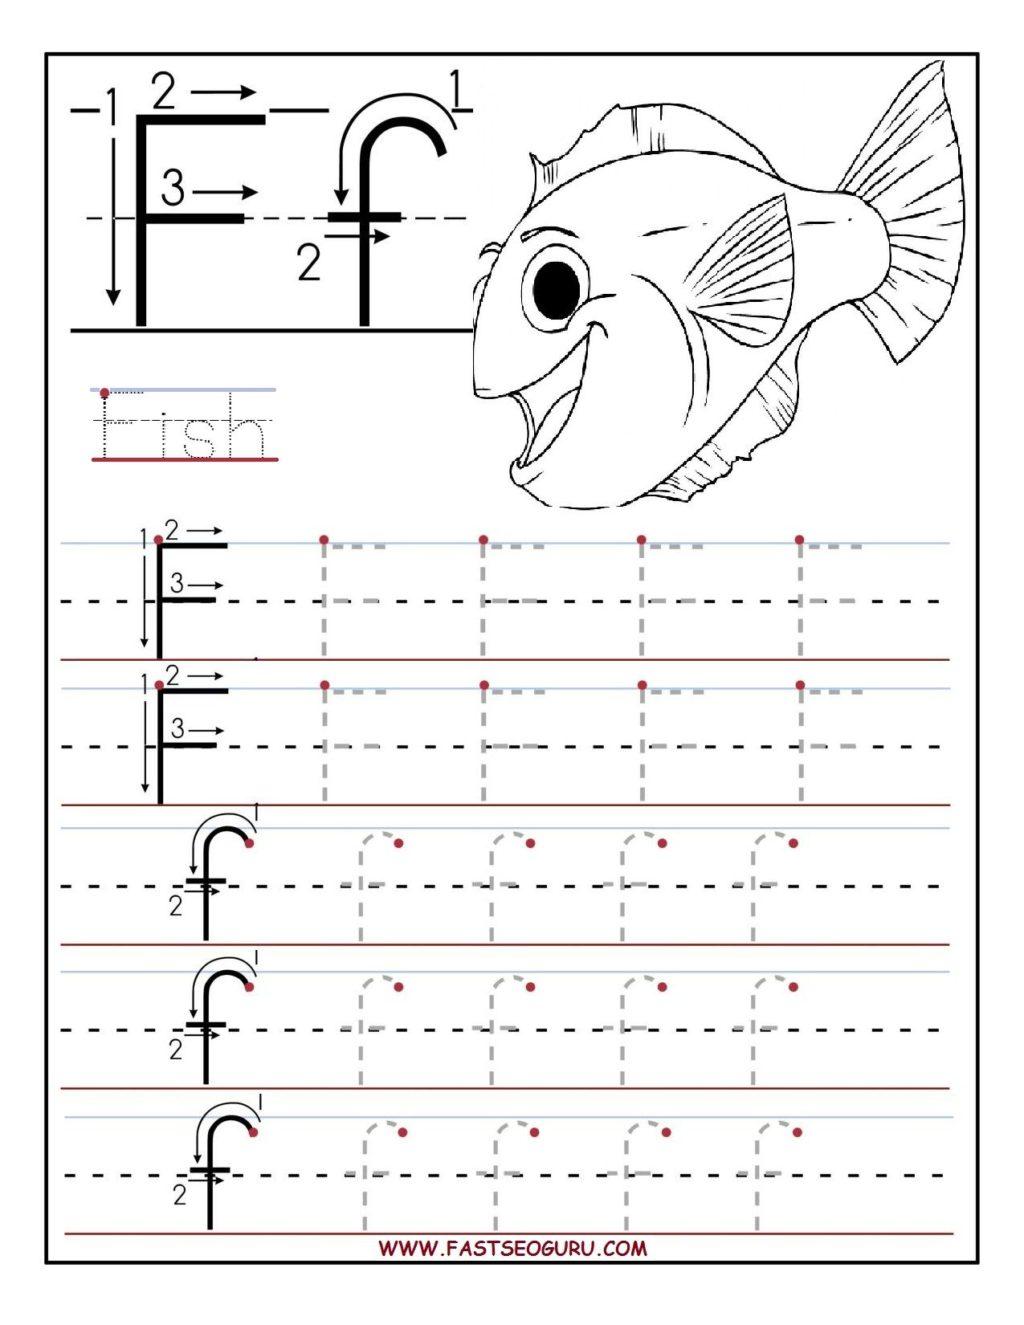 Worksheet Book Marvelous Letteracing Worksheets Photo Ideas